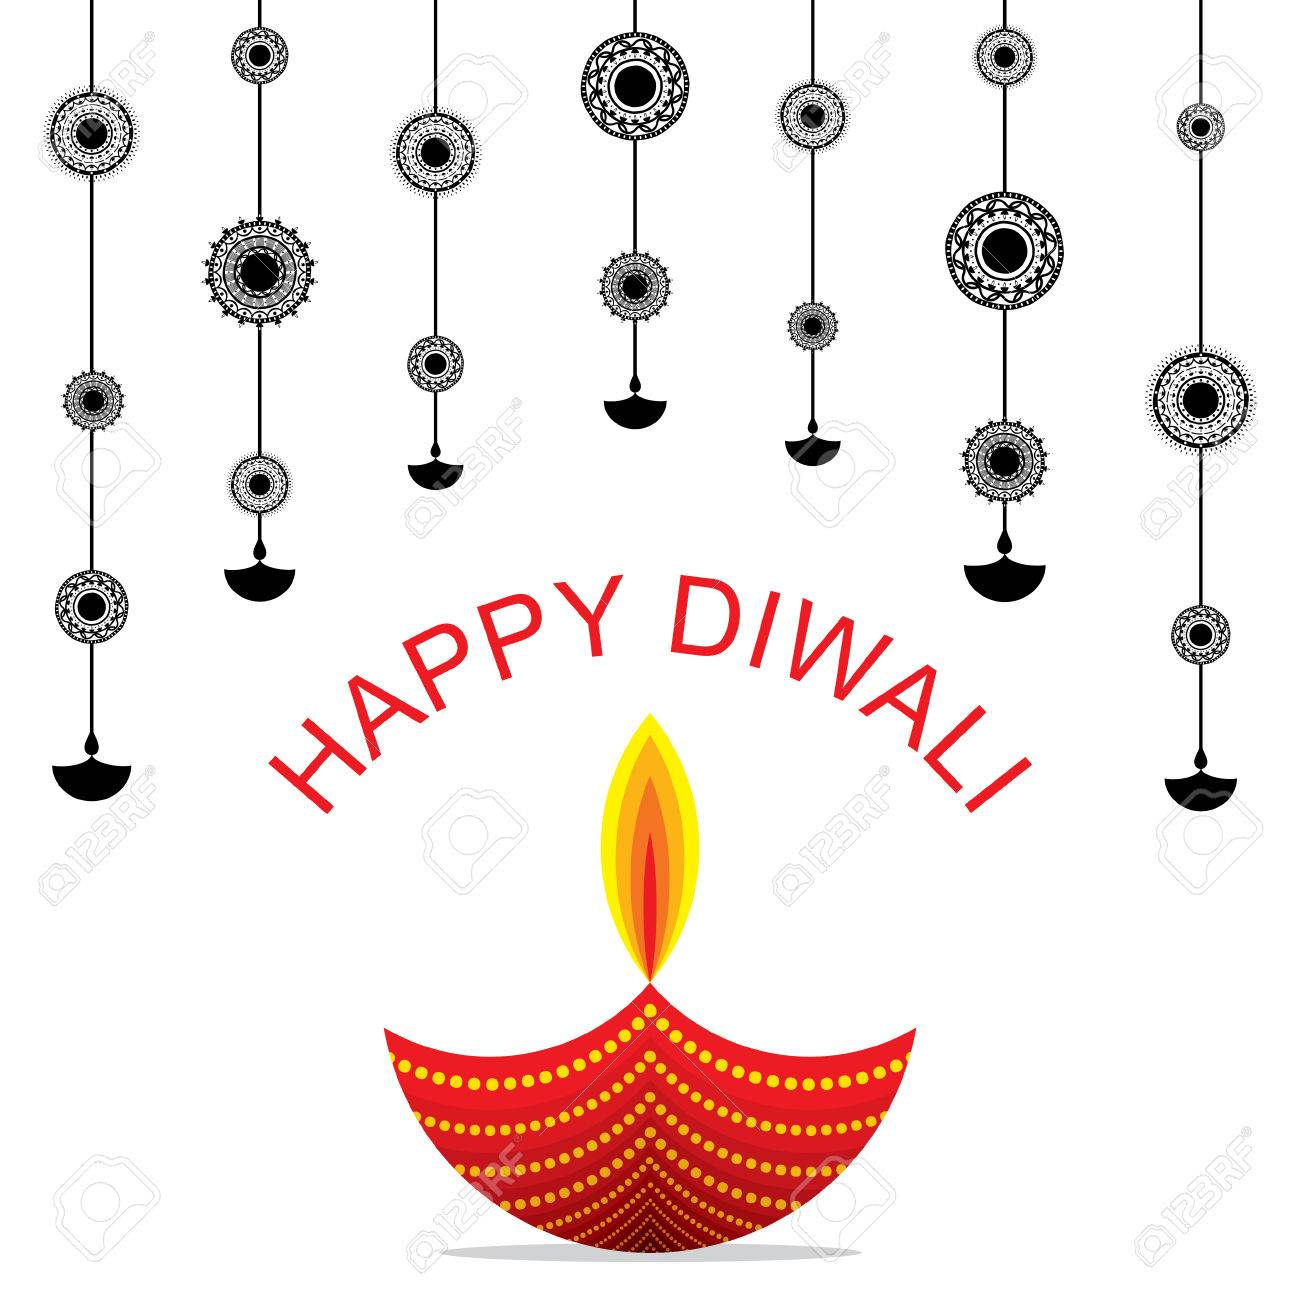 Creative Happy Diwali Greeting Design With Hanging Diya Pattern